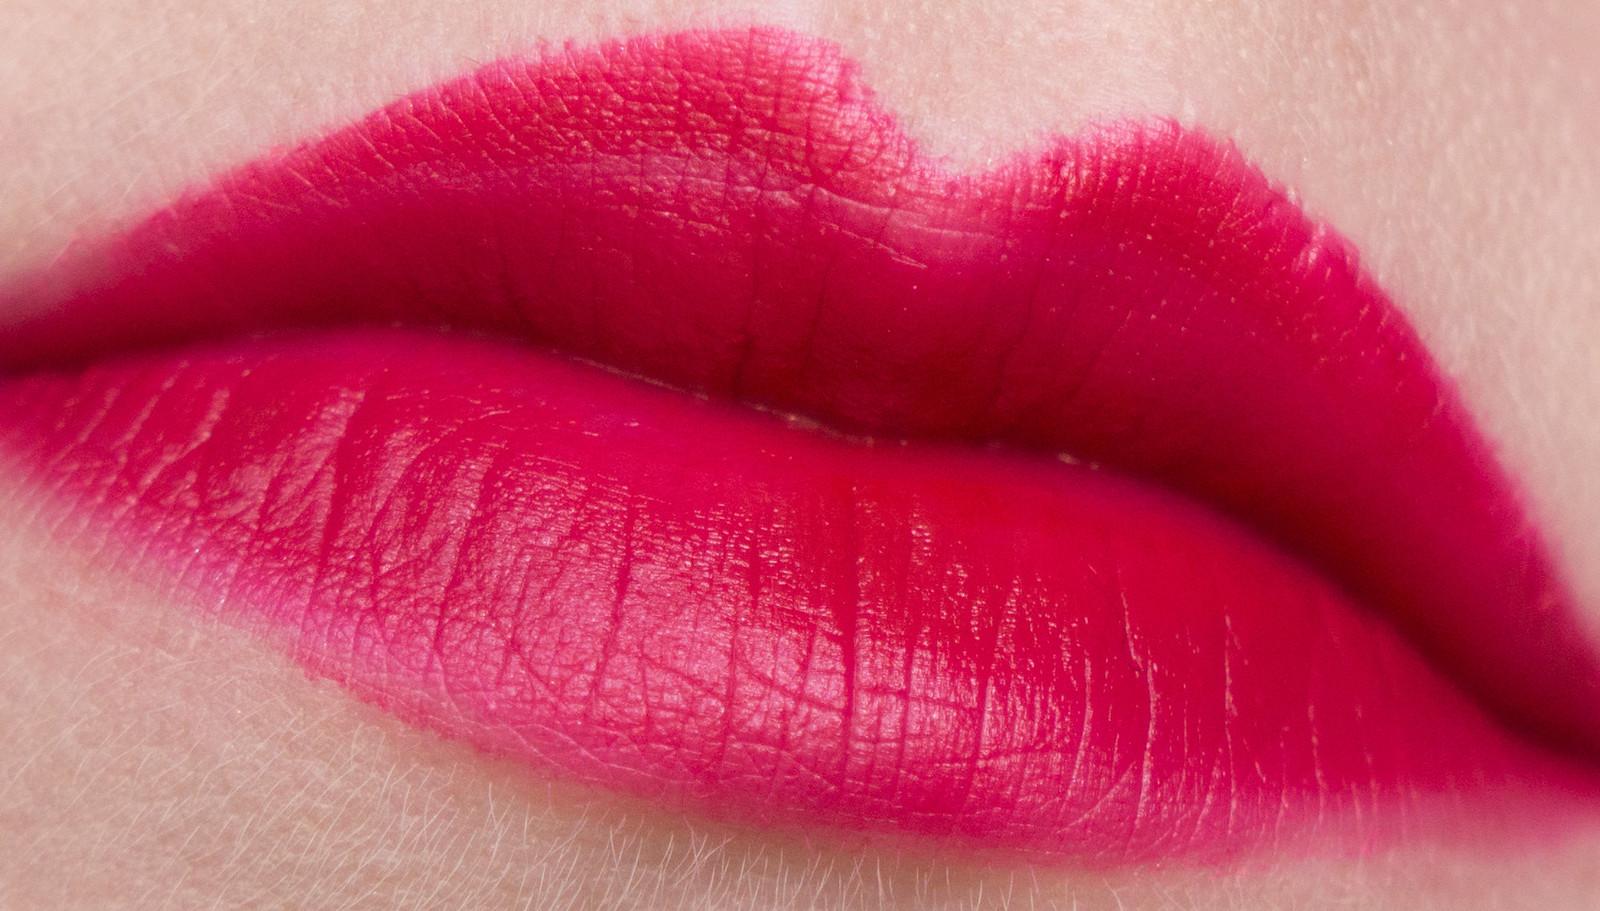 Lancome Matte Shaker 374 Kiss me Cherie